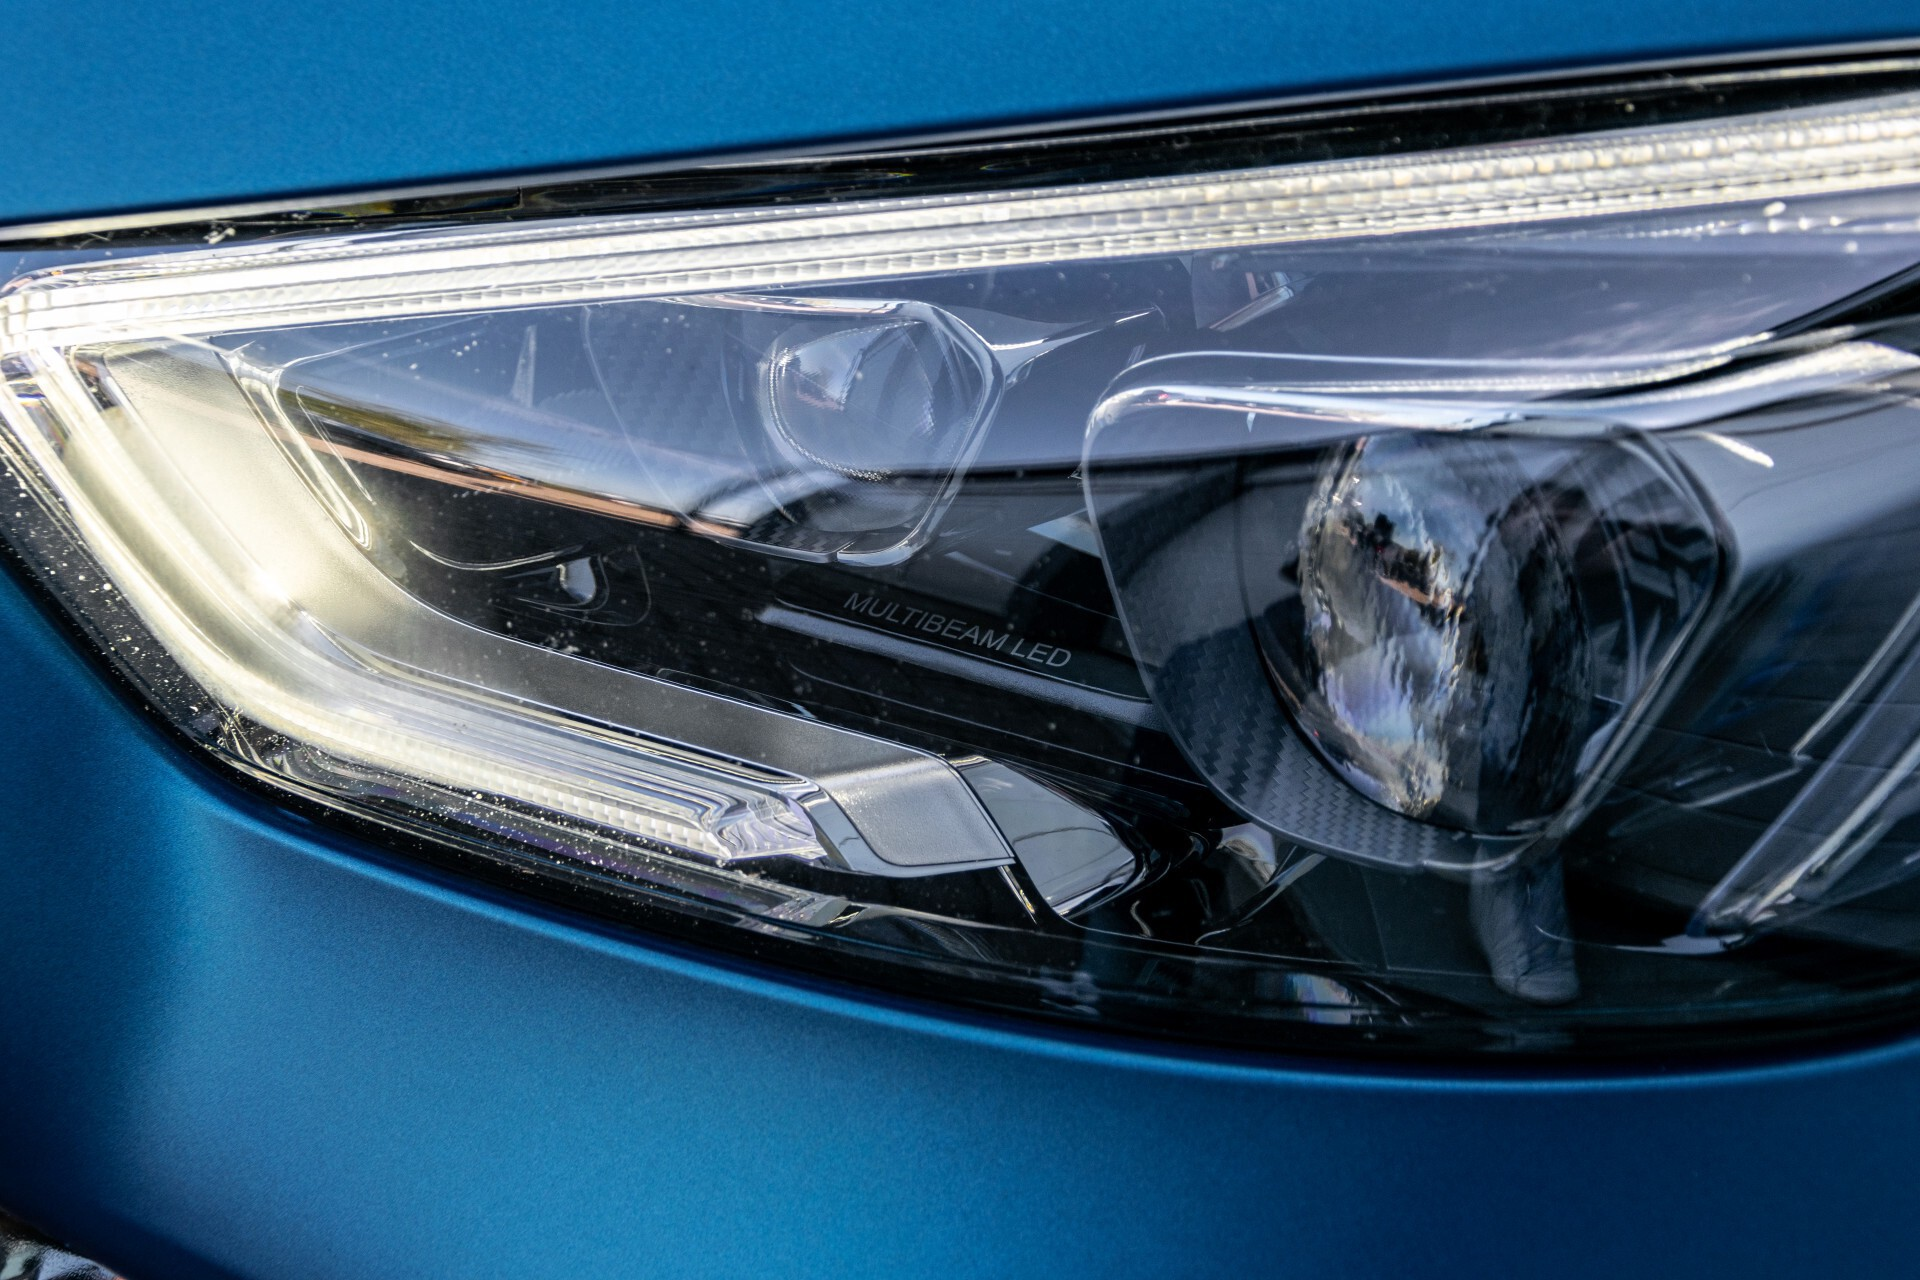 Mercedes-Benz AMG GT 4-Door Coupe 63 S 4MATIC+ Edition 1 Keramisch/Carbon/First Class/Dynamic Plus/Burmester High End 3D Aut9 Foto 85